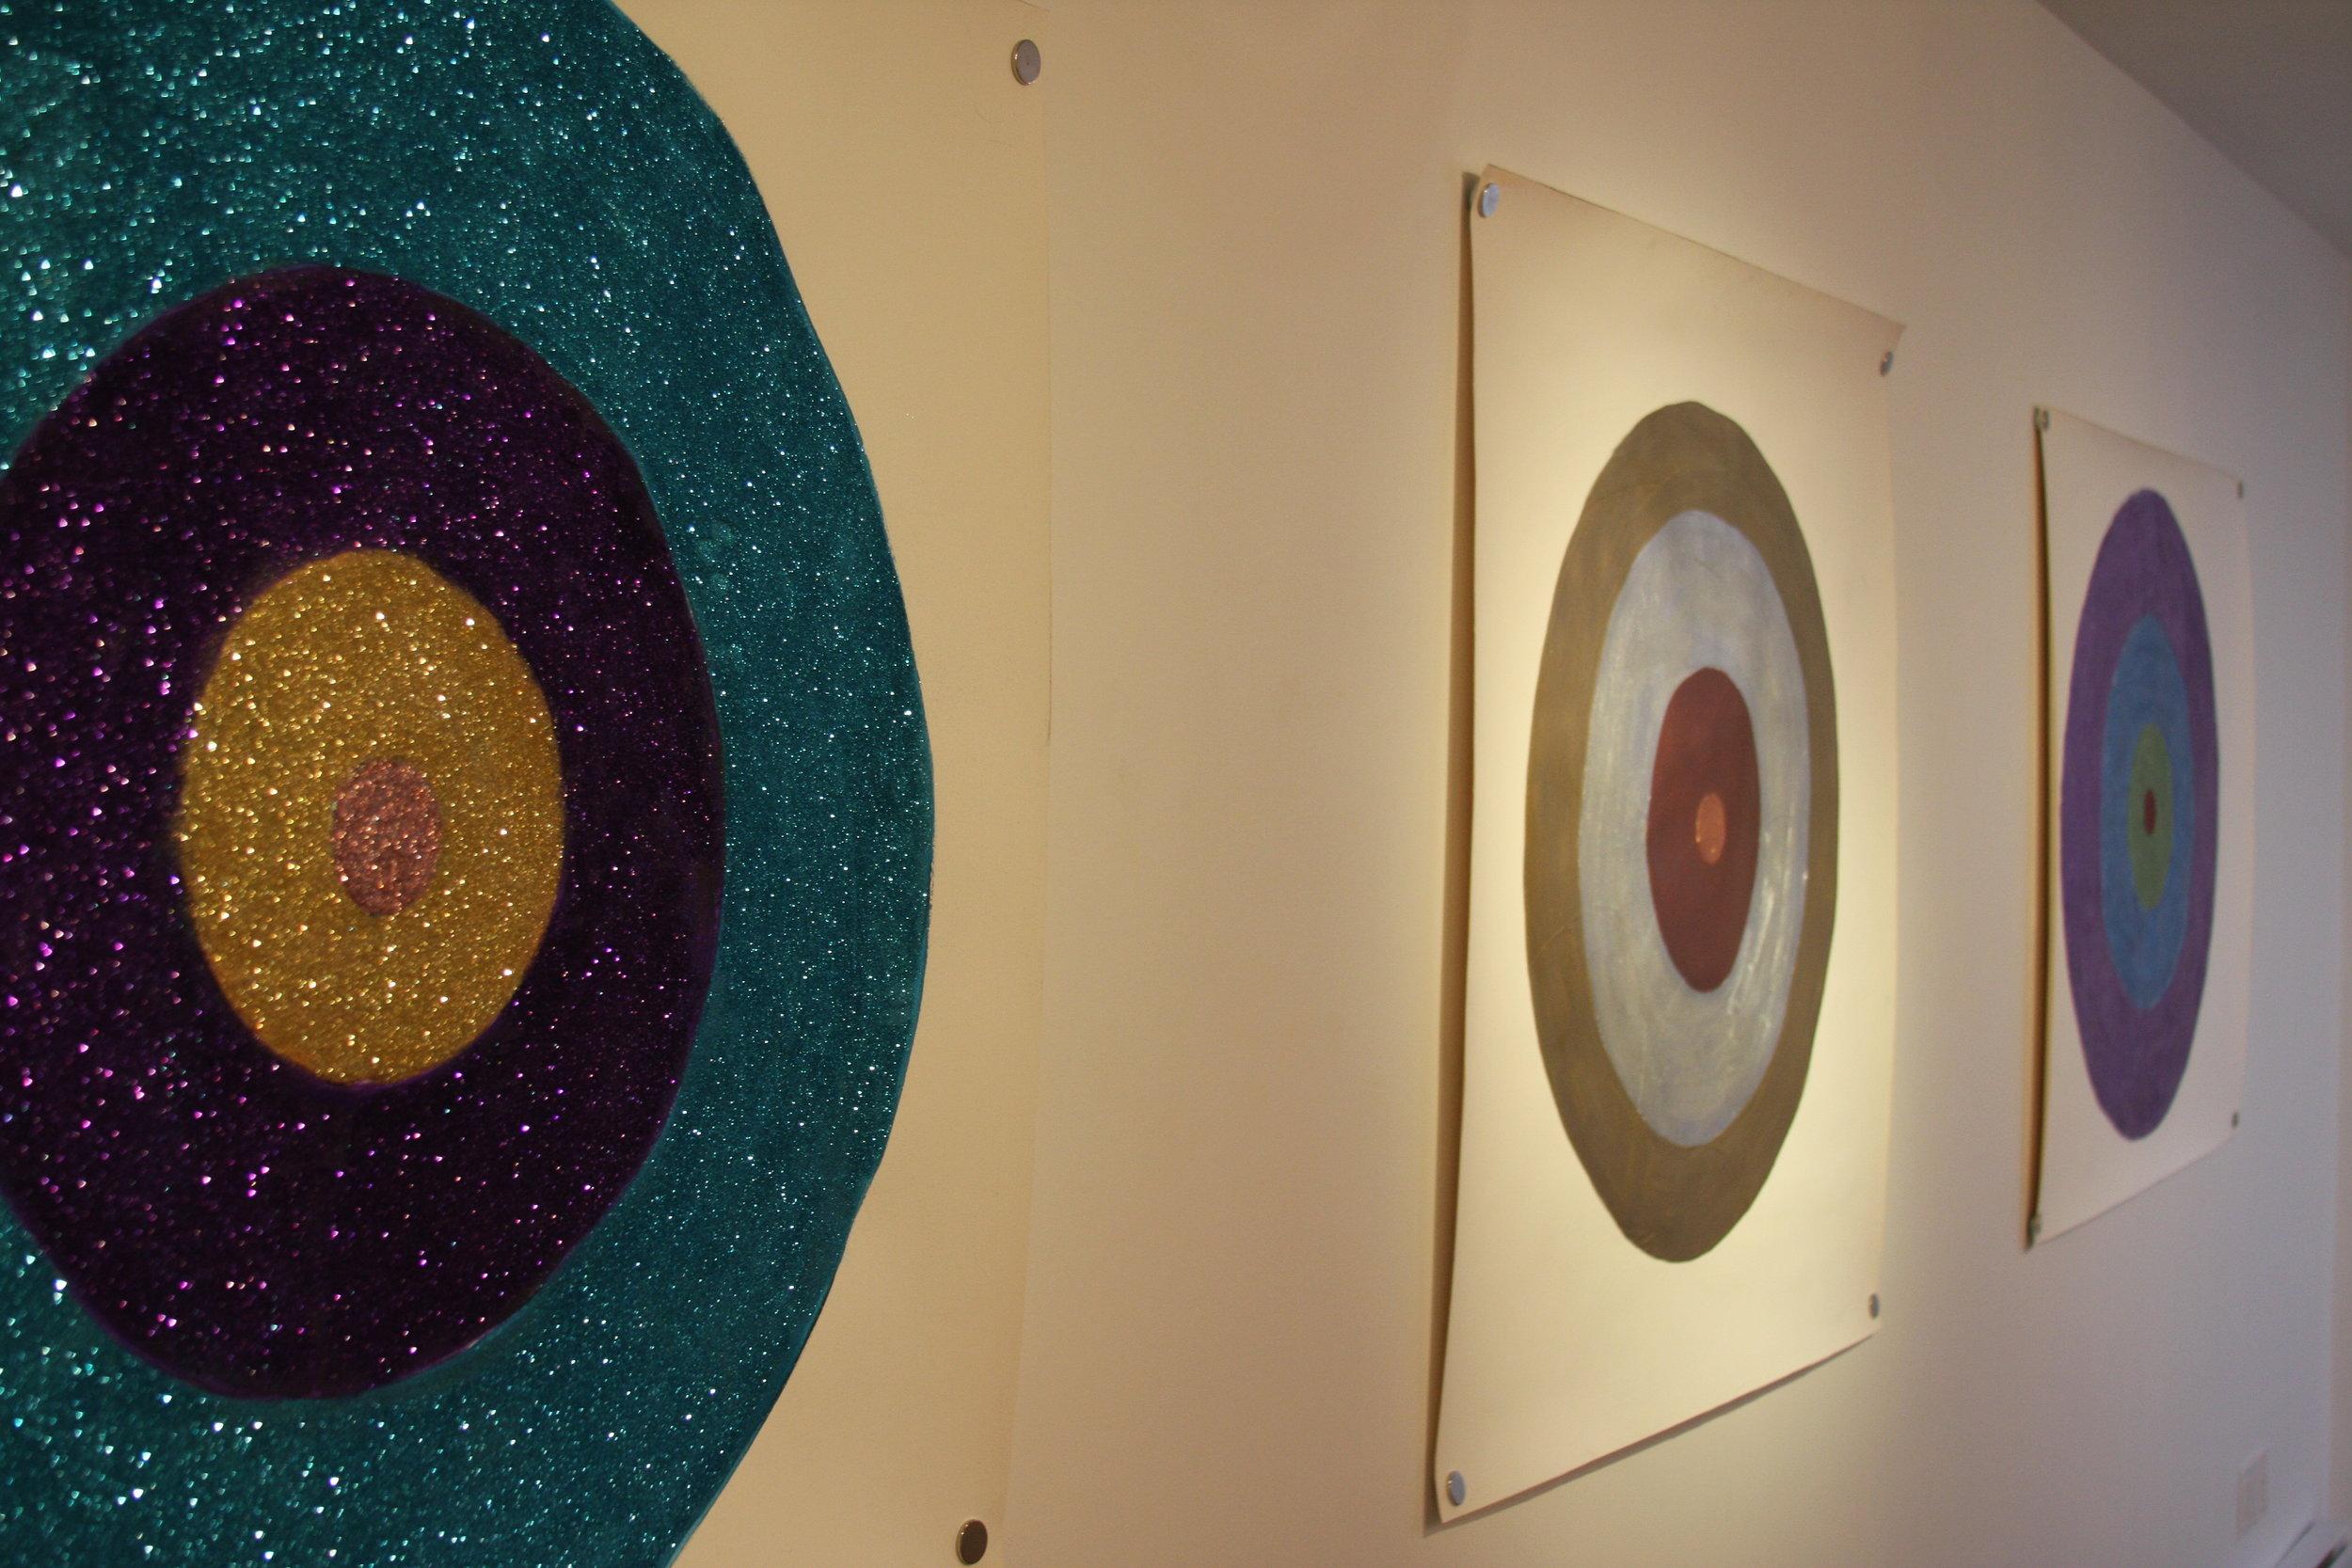 Sparkle paintings on paper 4 x 4 feet 2014.JPG